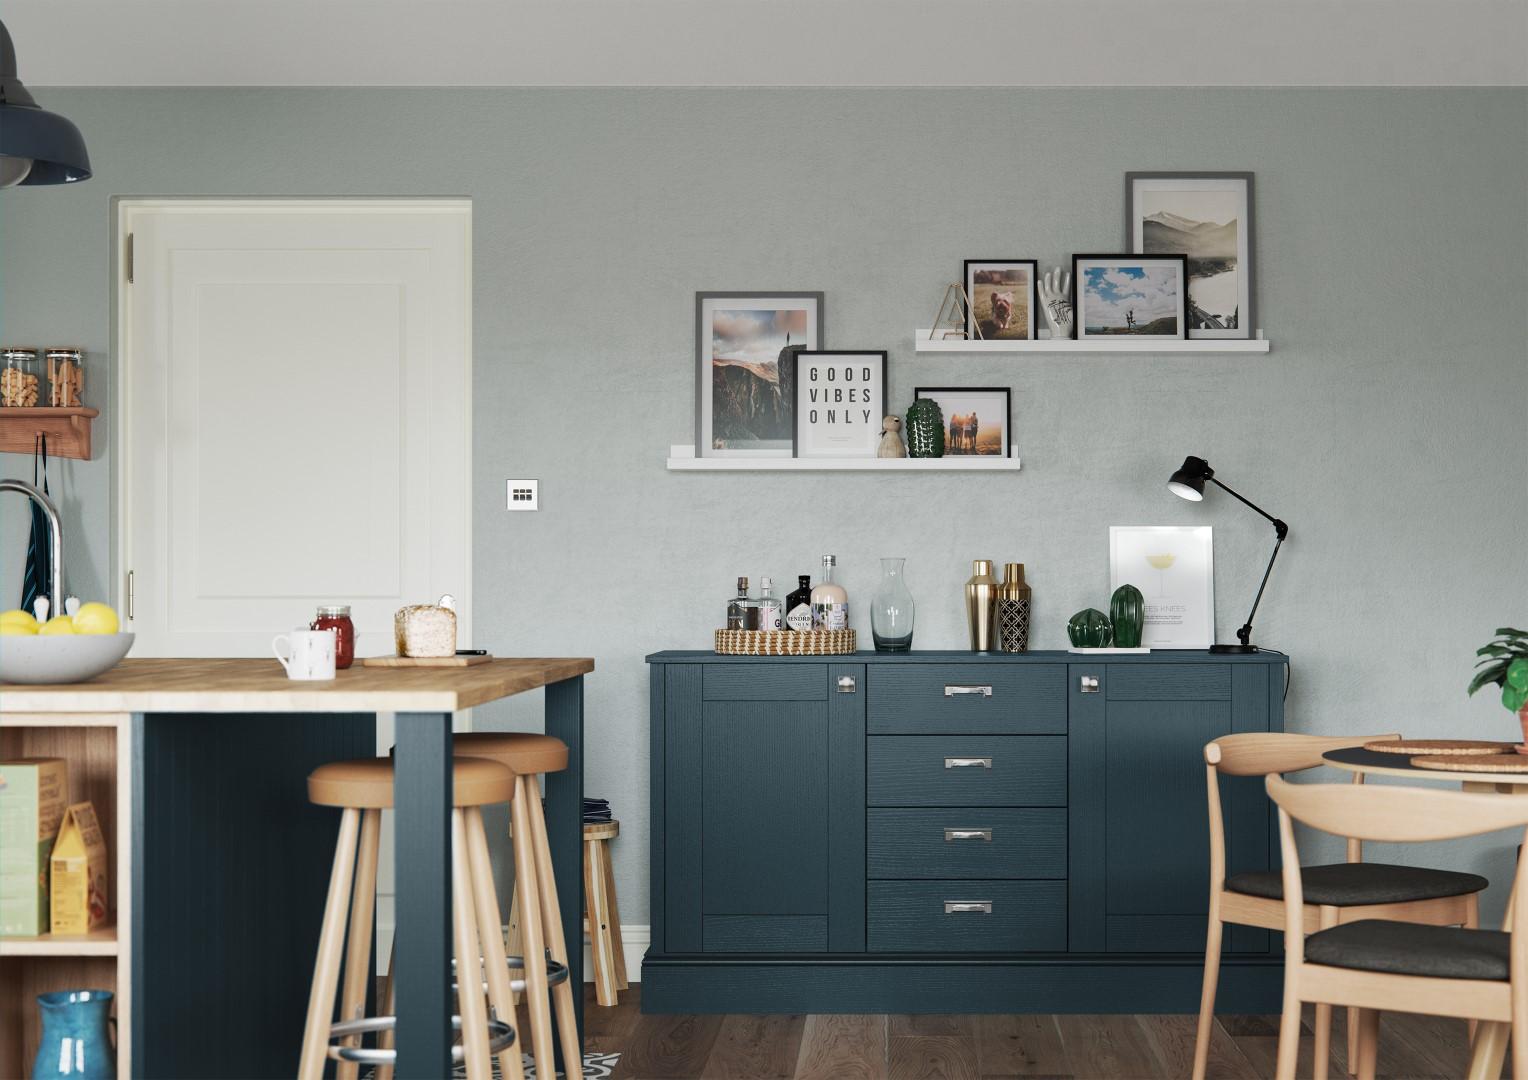 Madison Porcelain and Marine - Kitchen Design - Alan Kelly Kitchens - Waterford - 3